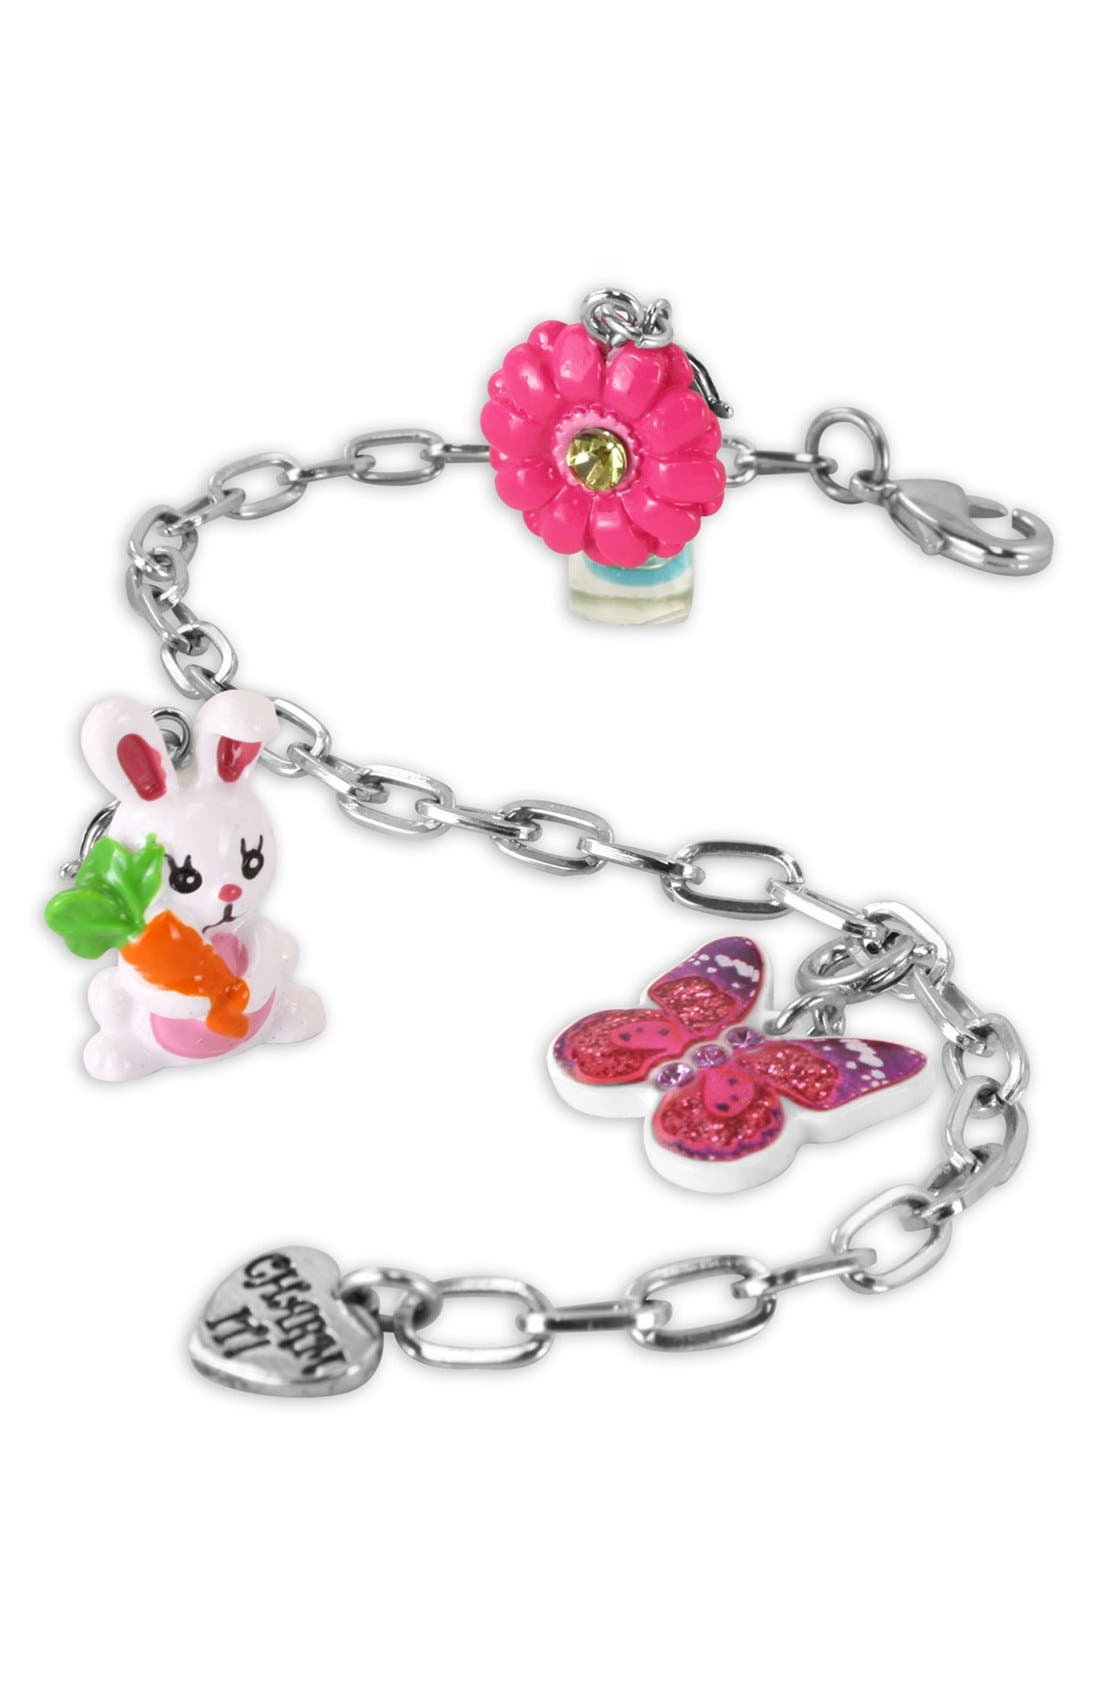 Alternate Image 2  - CHARM IT!® 'Spring' Charm Bracelet Gift Set (Girls)